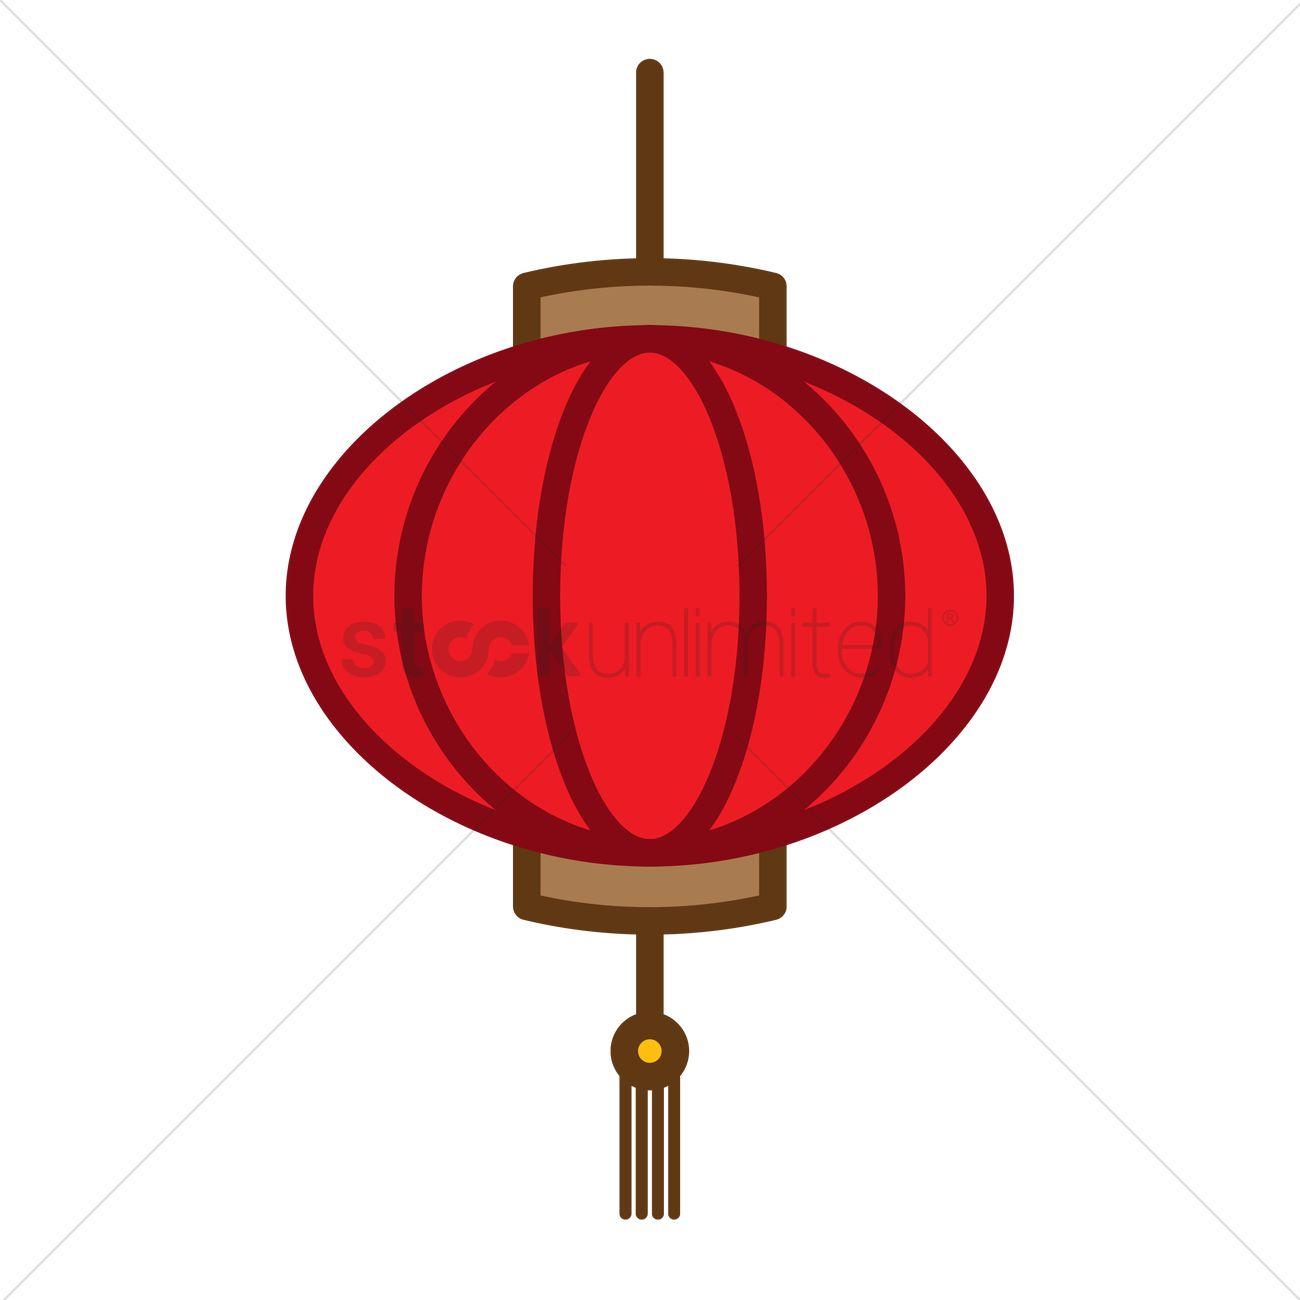 Chinese lantern Vector Image - 1972779 | StockUnlimited